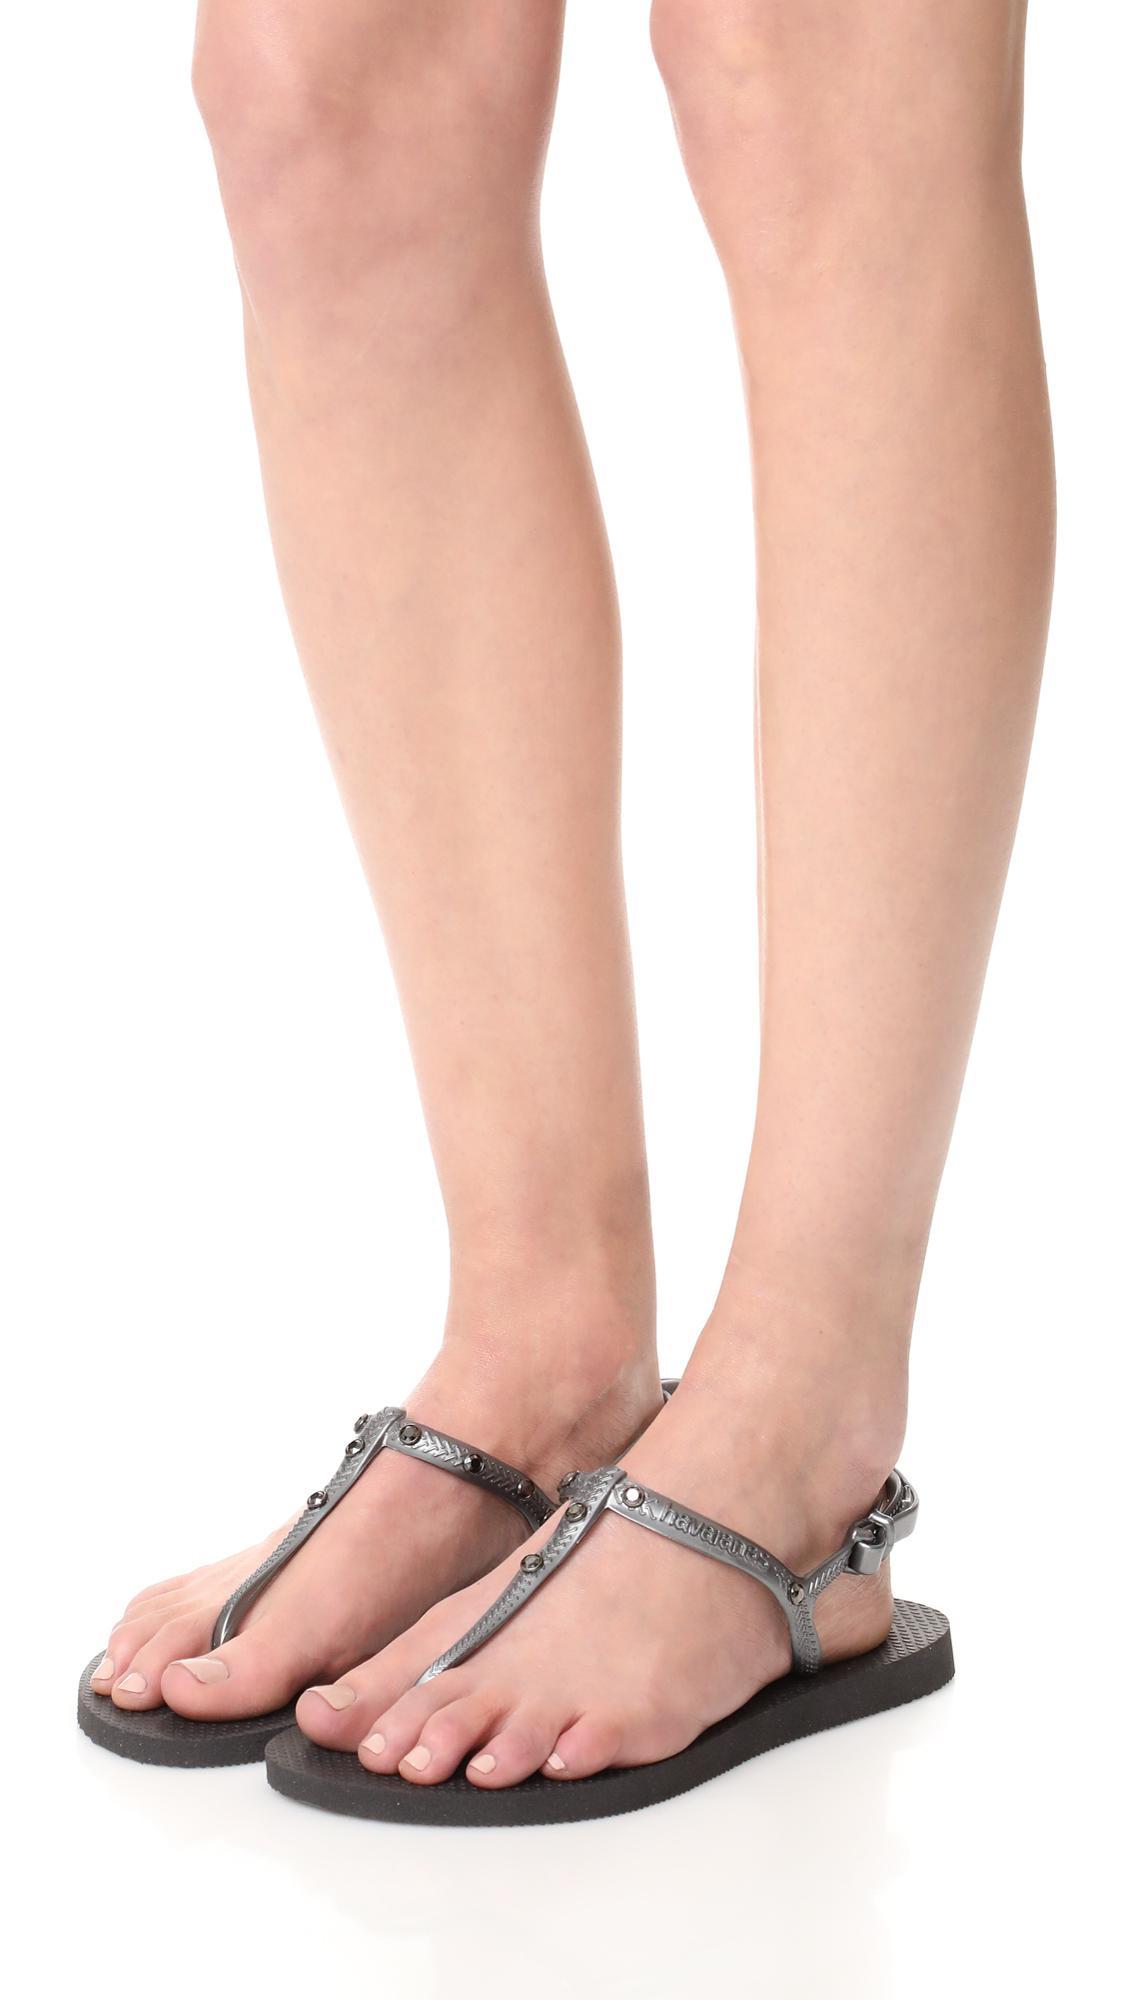 77fc5c9c34854 Havaianas Freedom Crystal Sandals in Black - Lyst